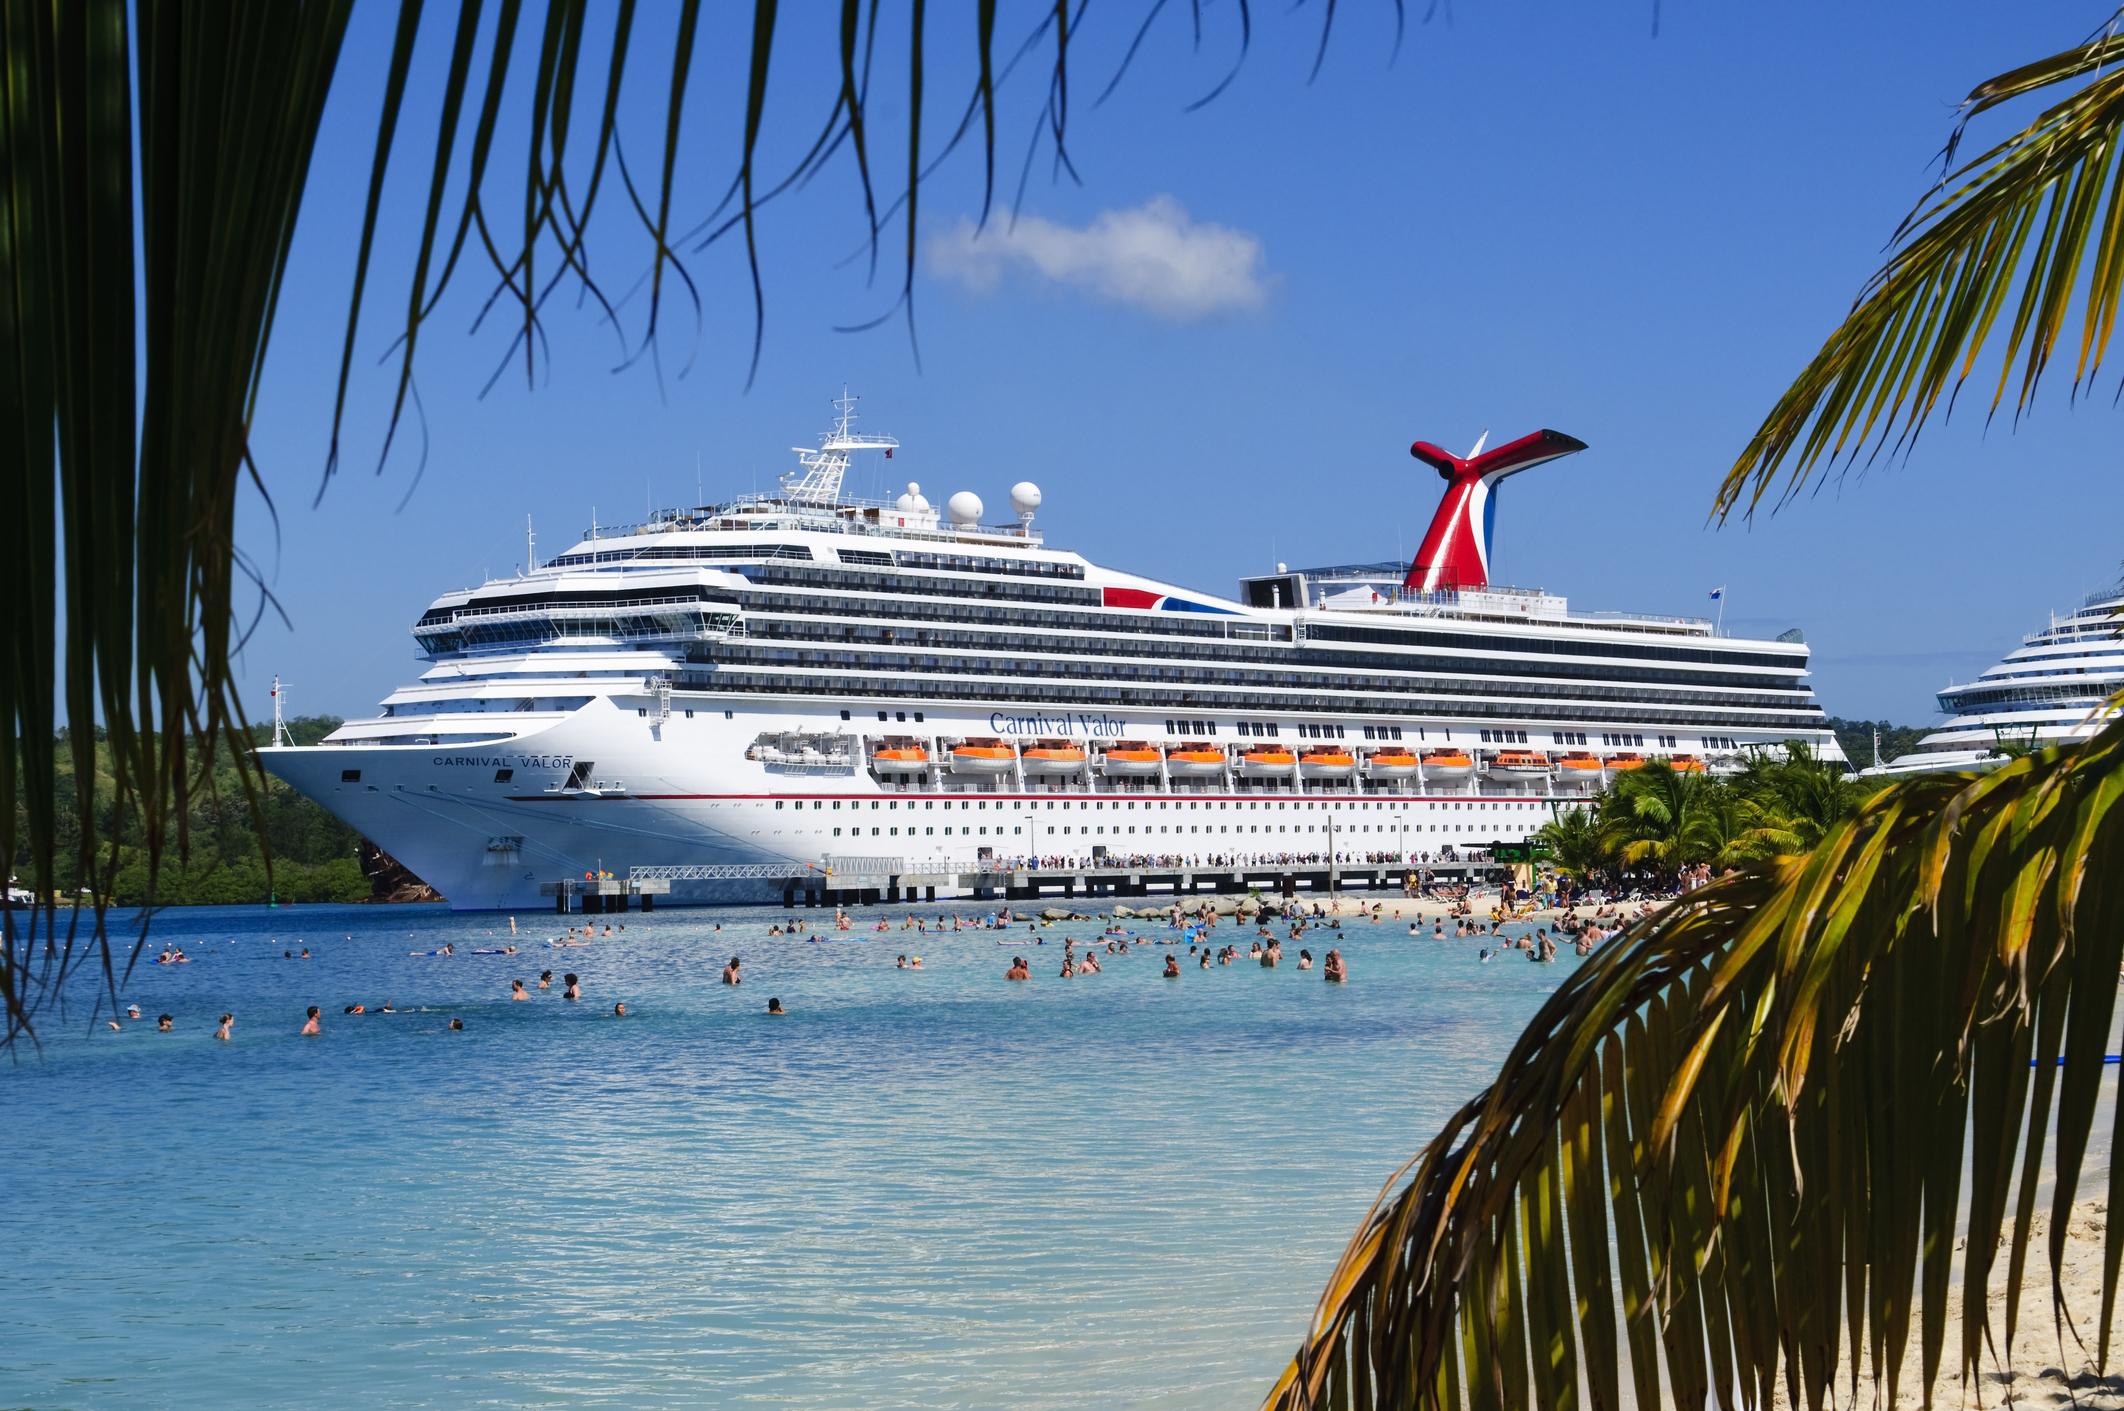 nave da crociera ai Caraibi